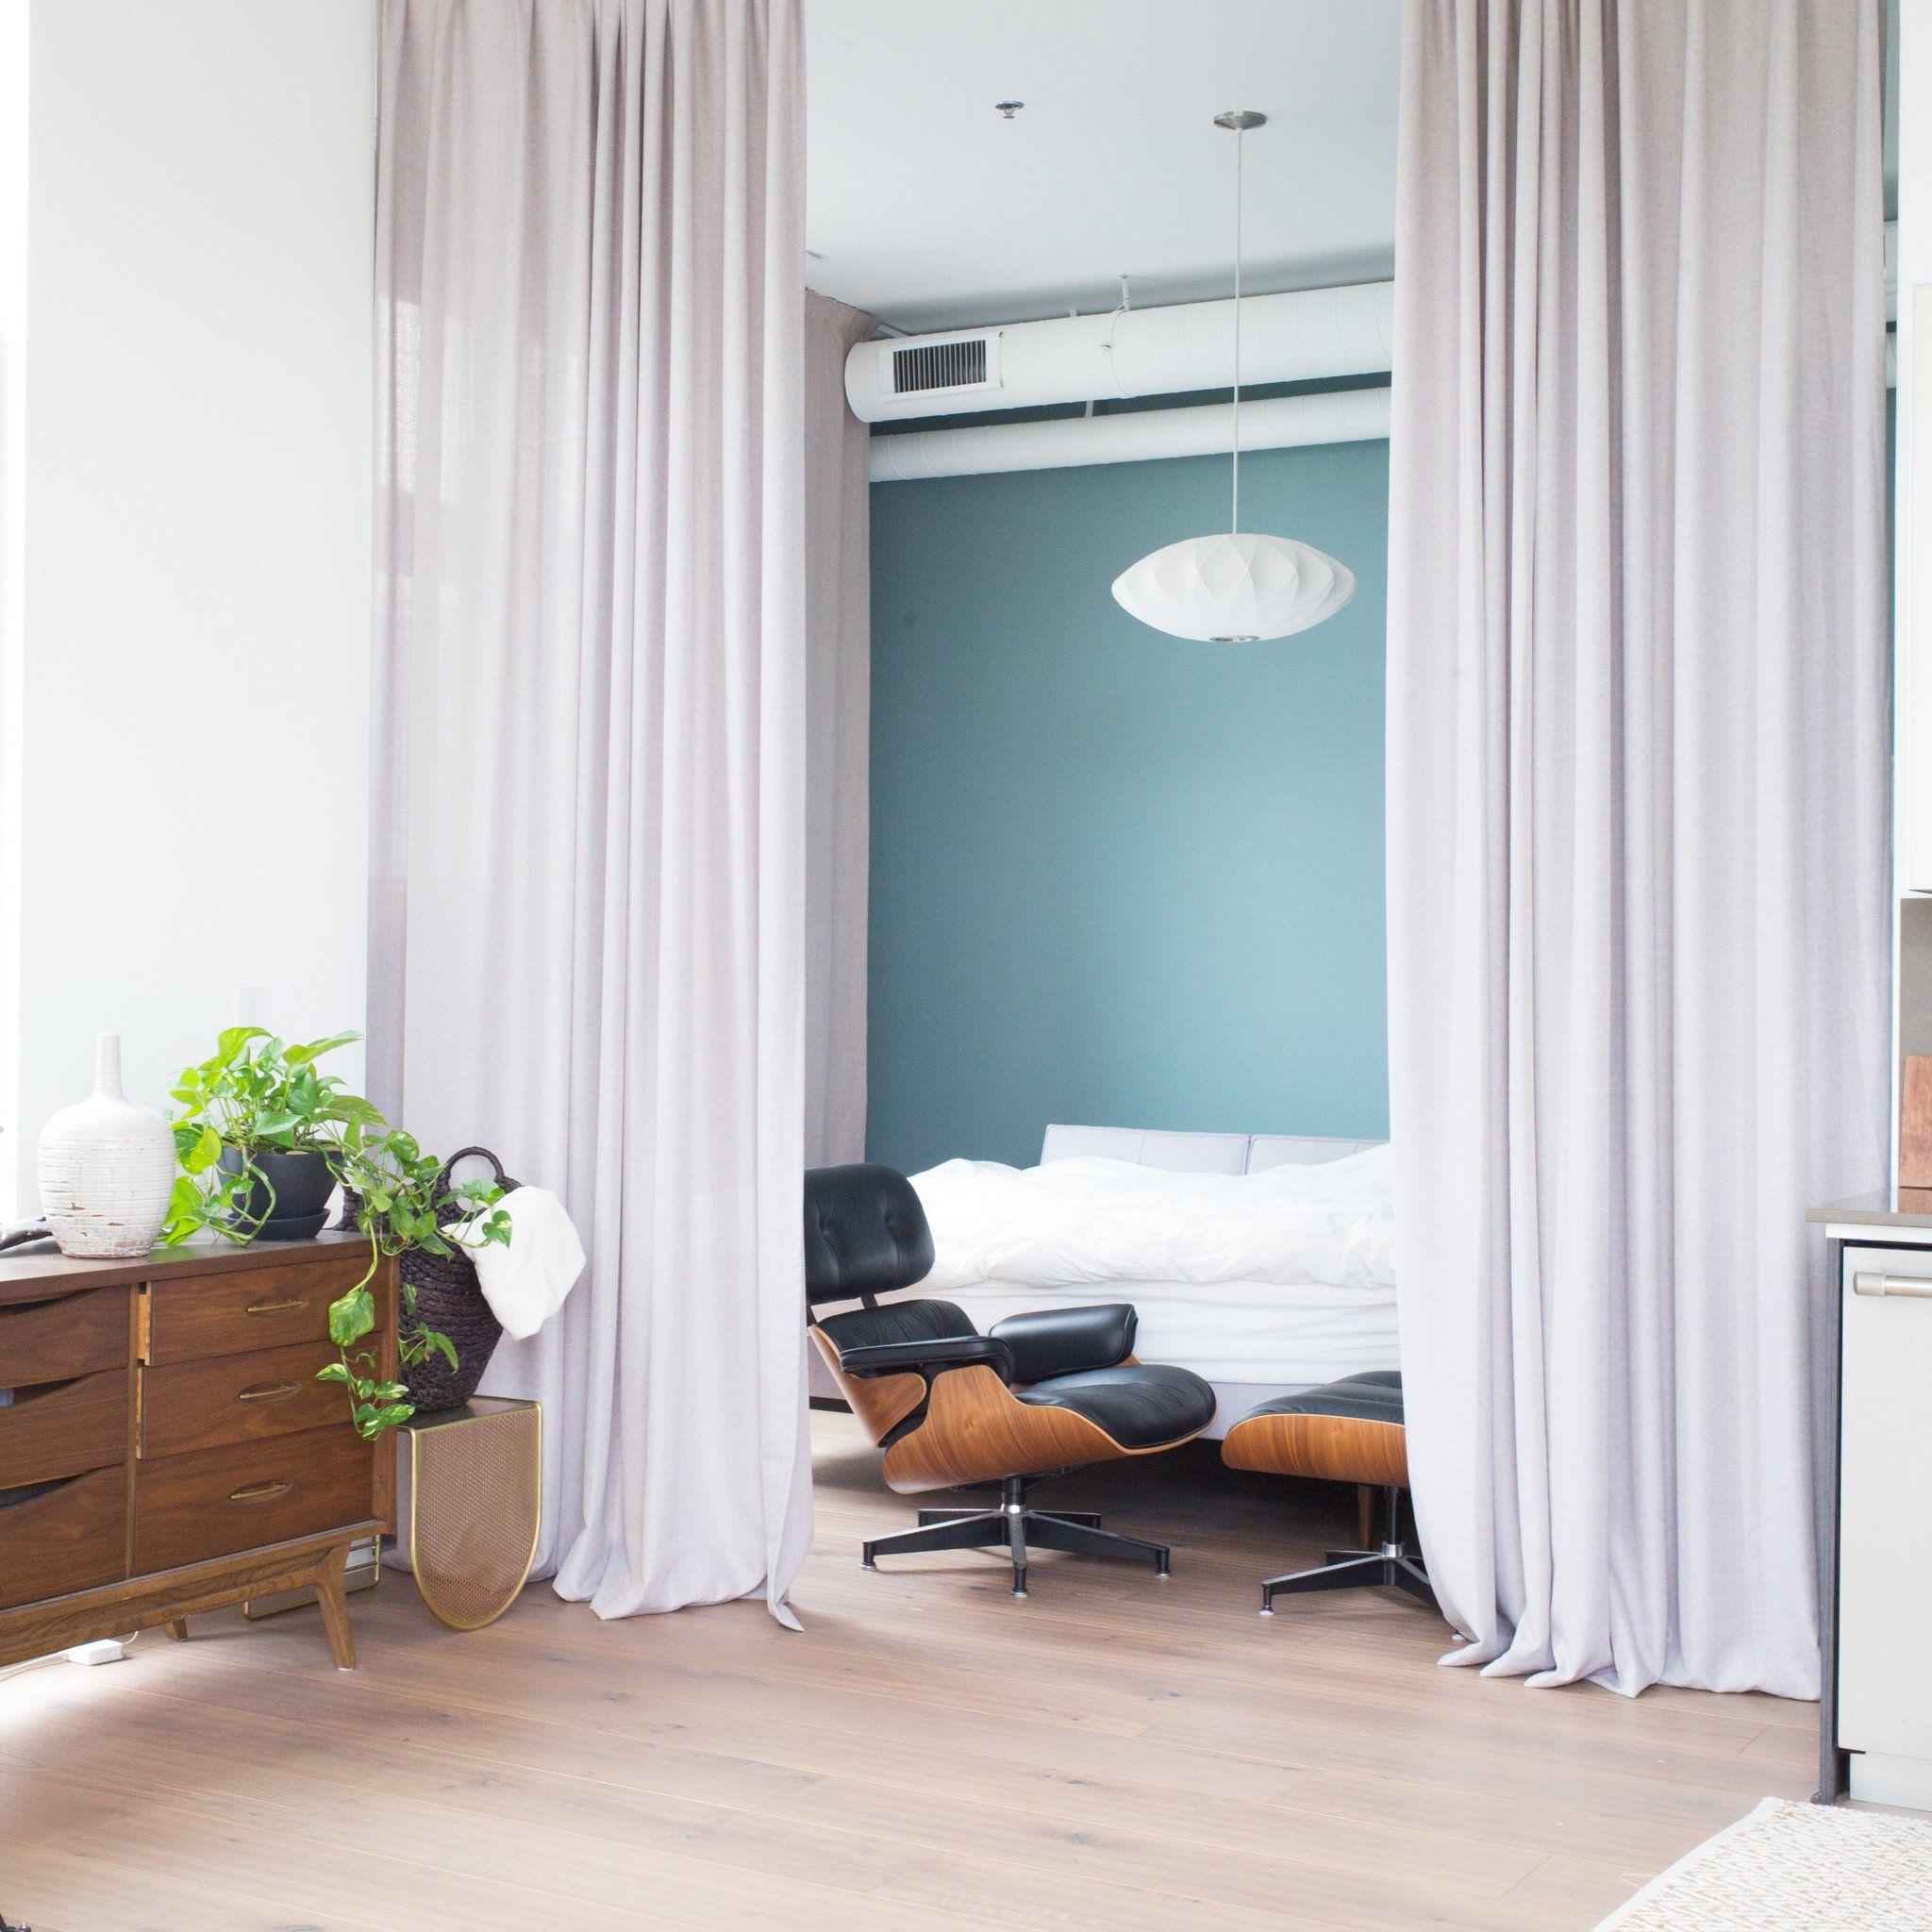 Do It Yourself Room Divider Installation Ceiling Tracks Loft